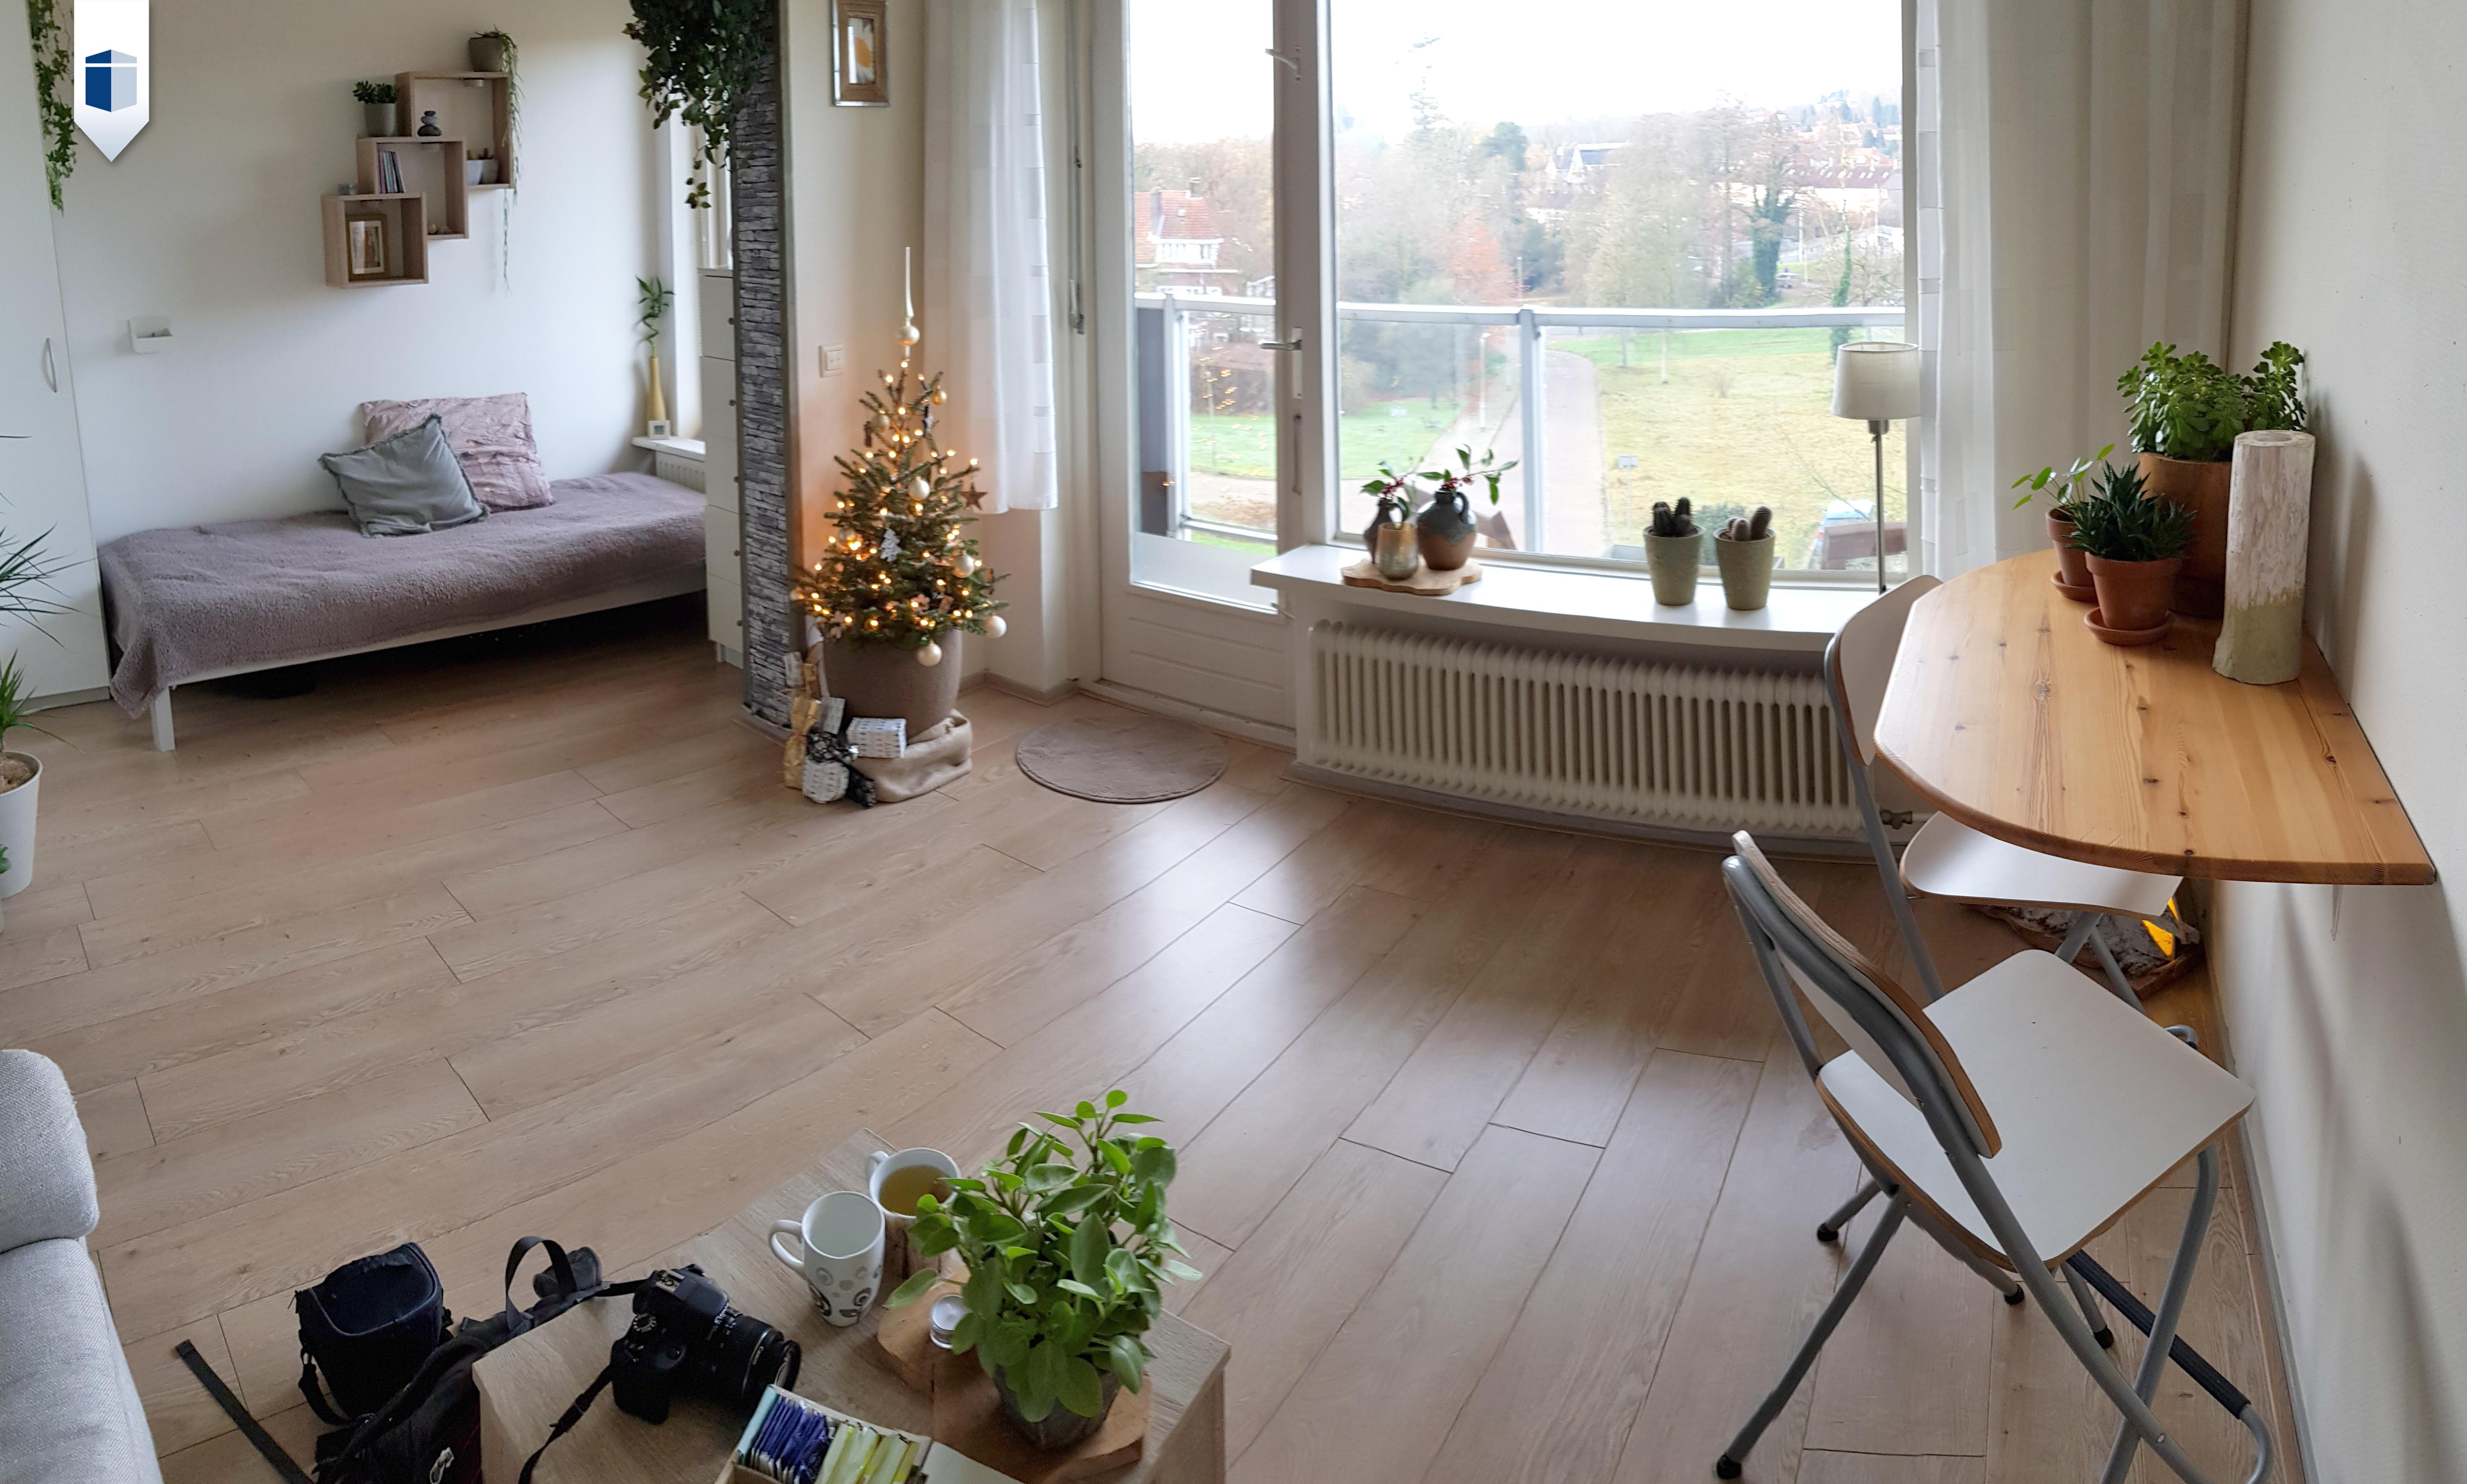 Kleine Woning Inrichting : Zo kun je een kleine studio prachtig inrichten interveste infonet